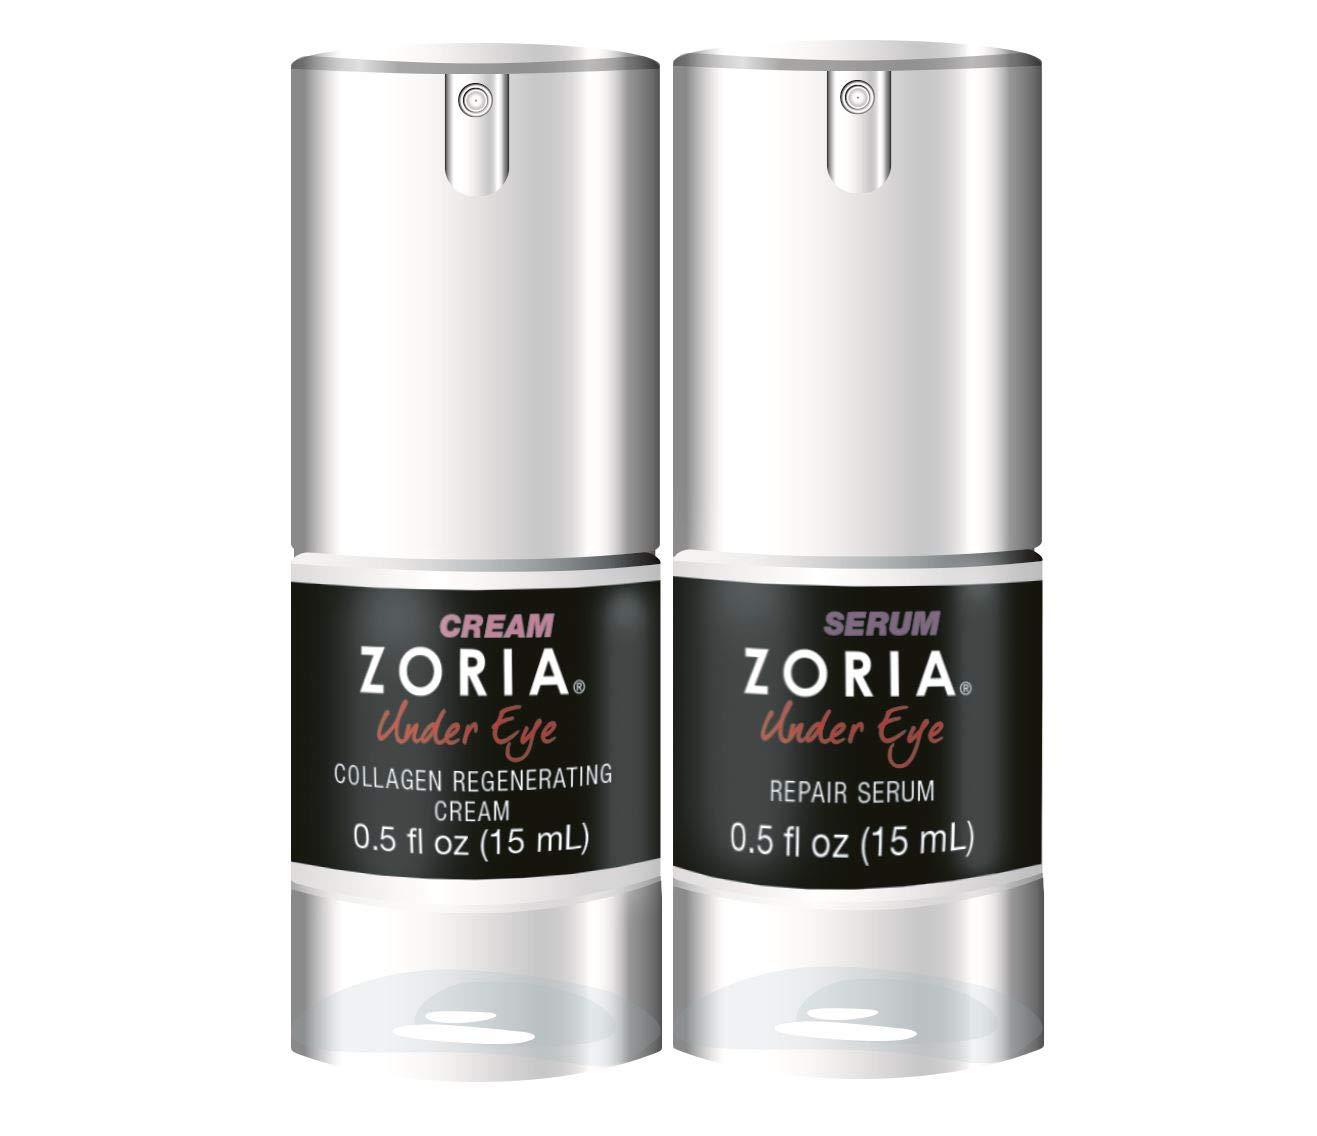 Zoria Under Eye Dual Treatment Kit